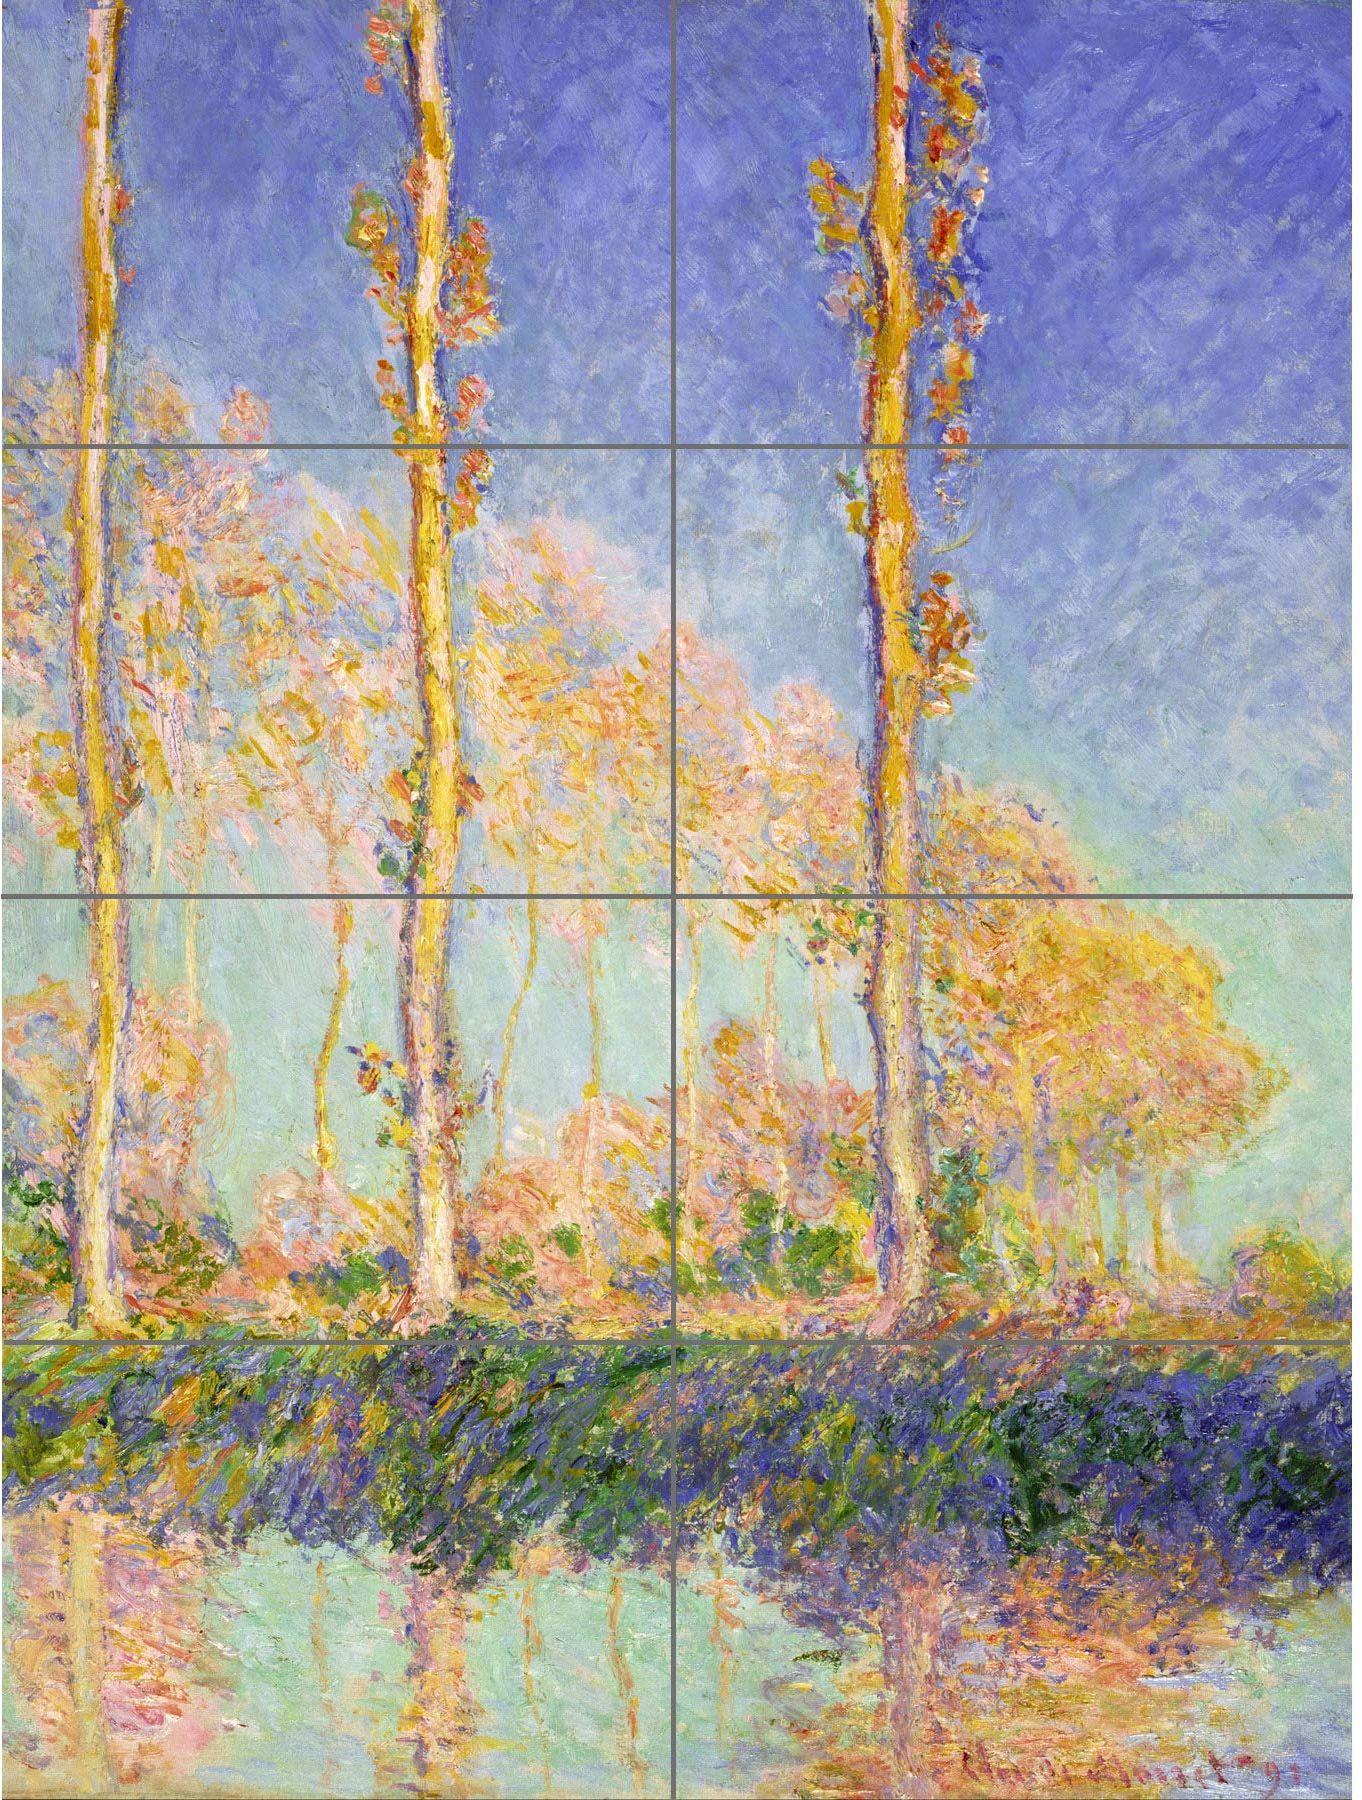 Artery8 Claude Monet plakat topoli francuskich, XL, 8 części